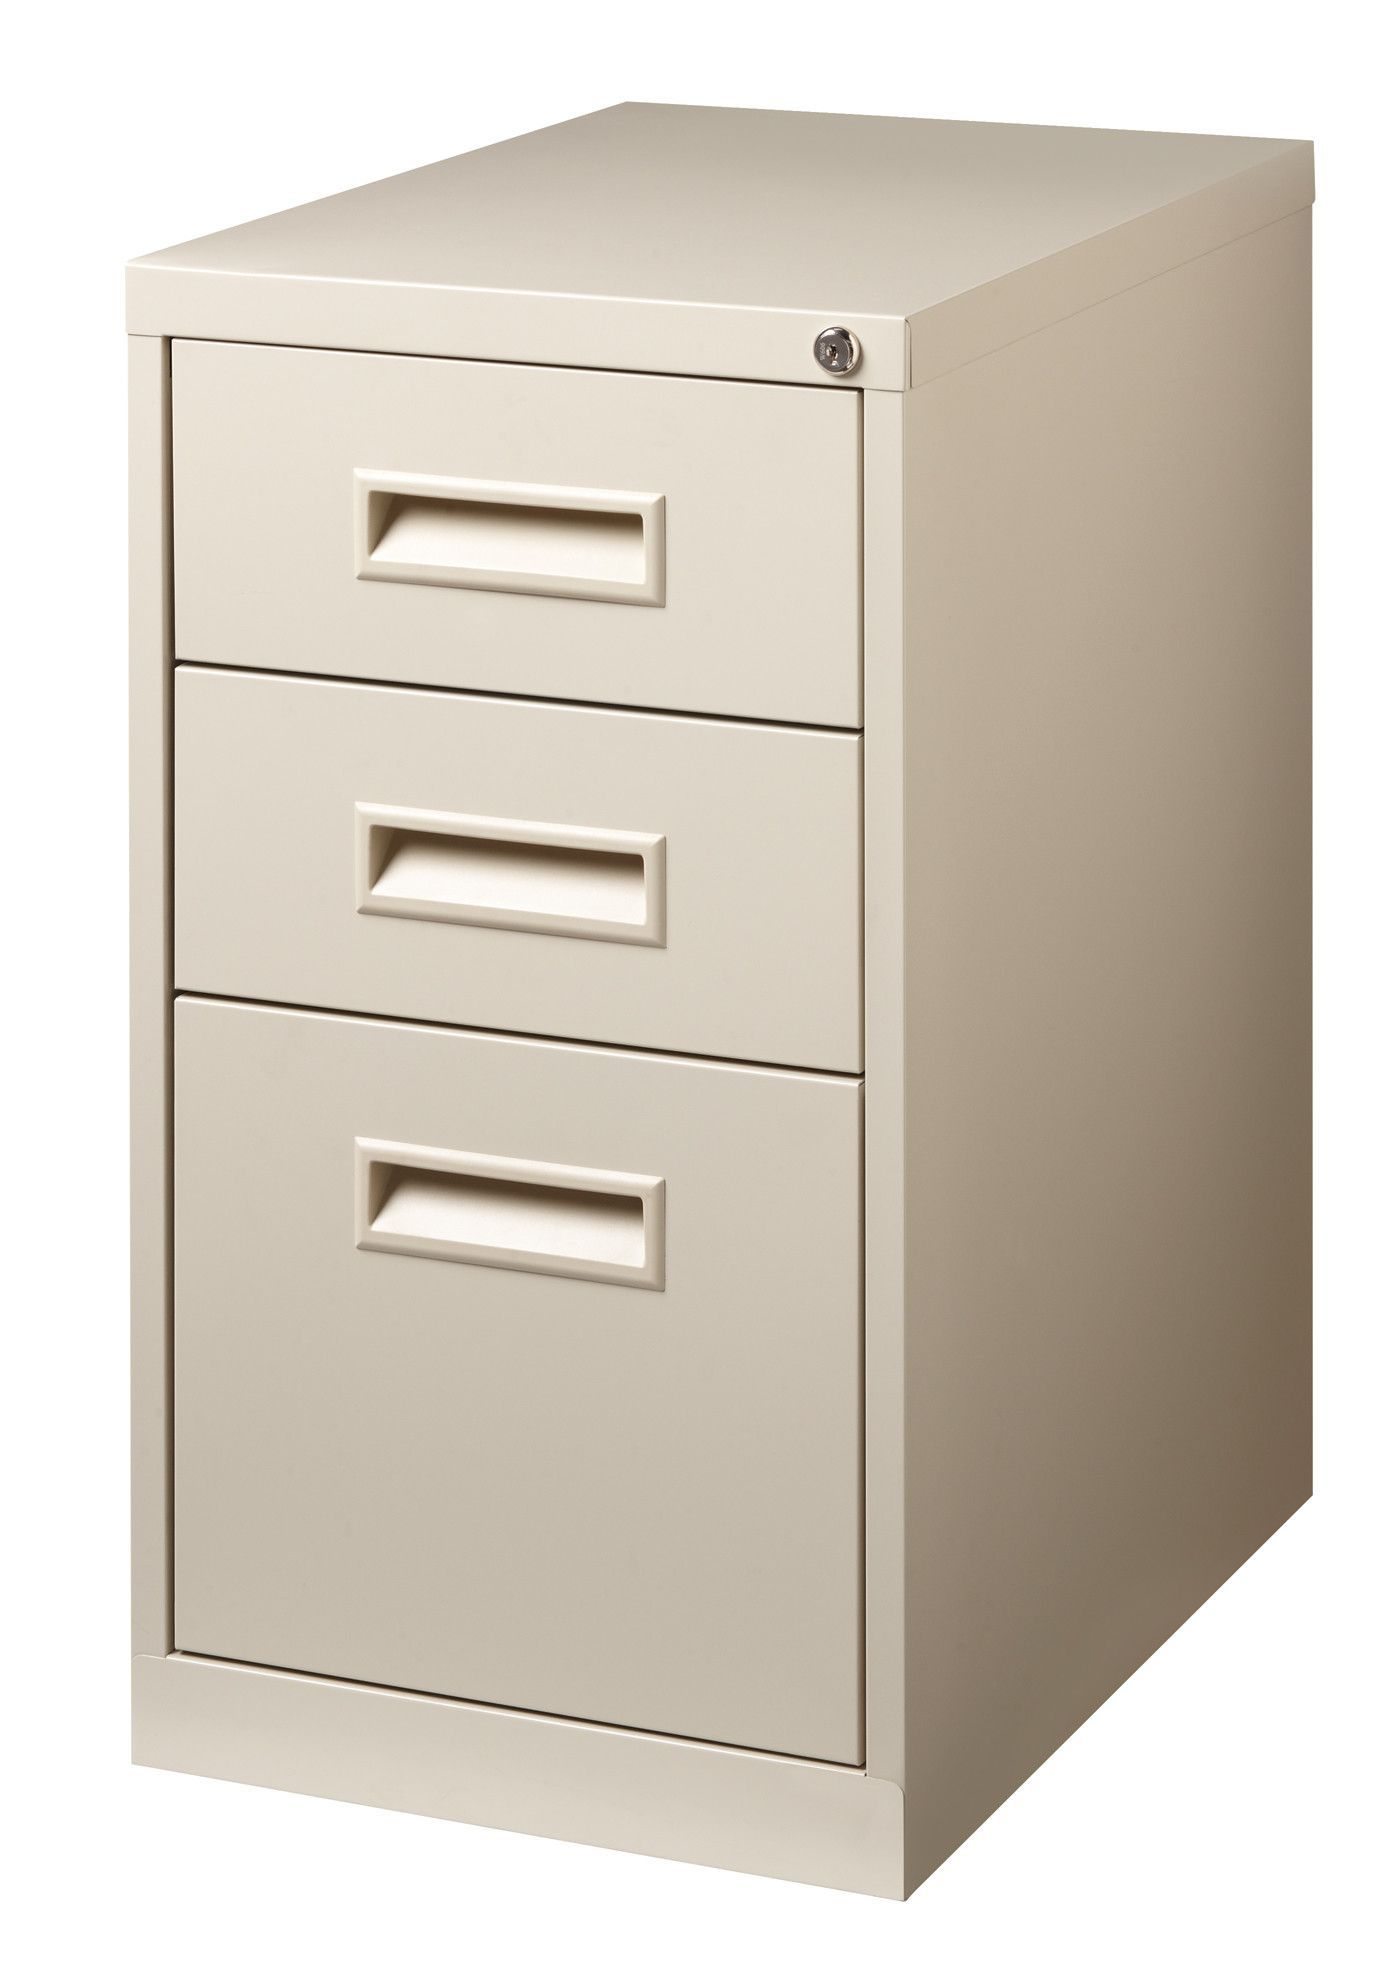 3 Drawer Mobile Vertical Filing Cabinet Filing Cabinet Drawers